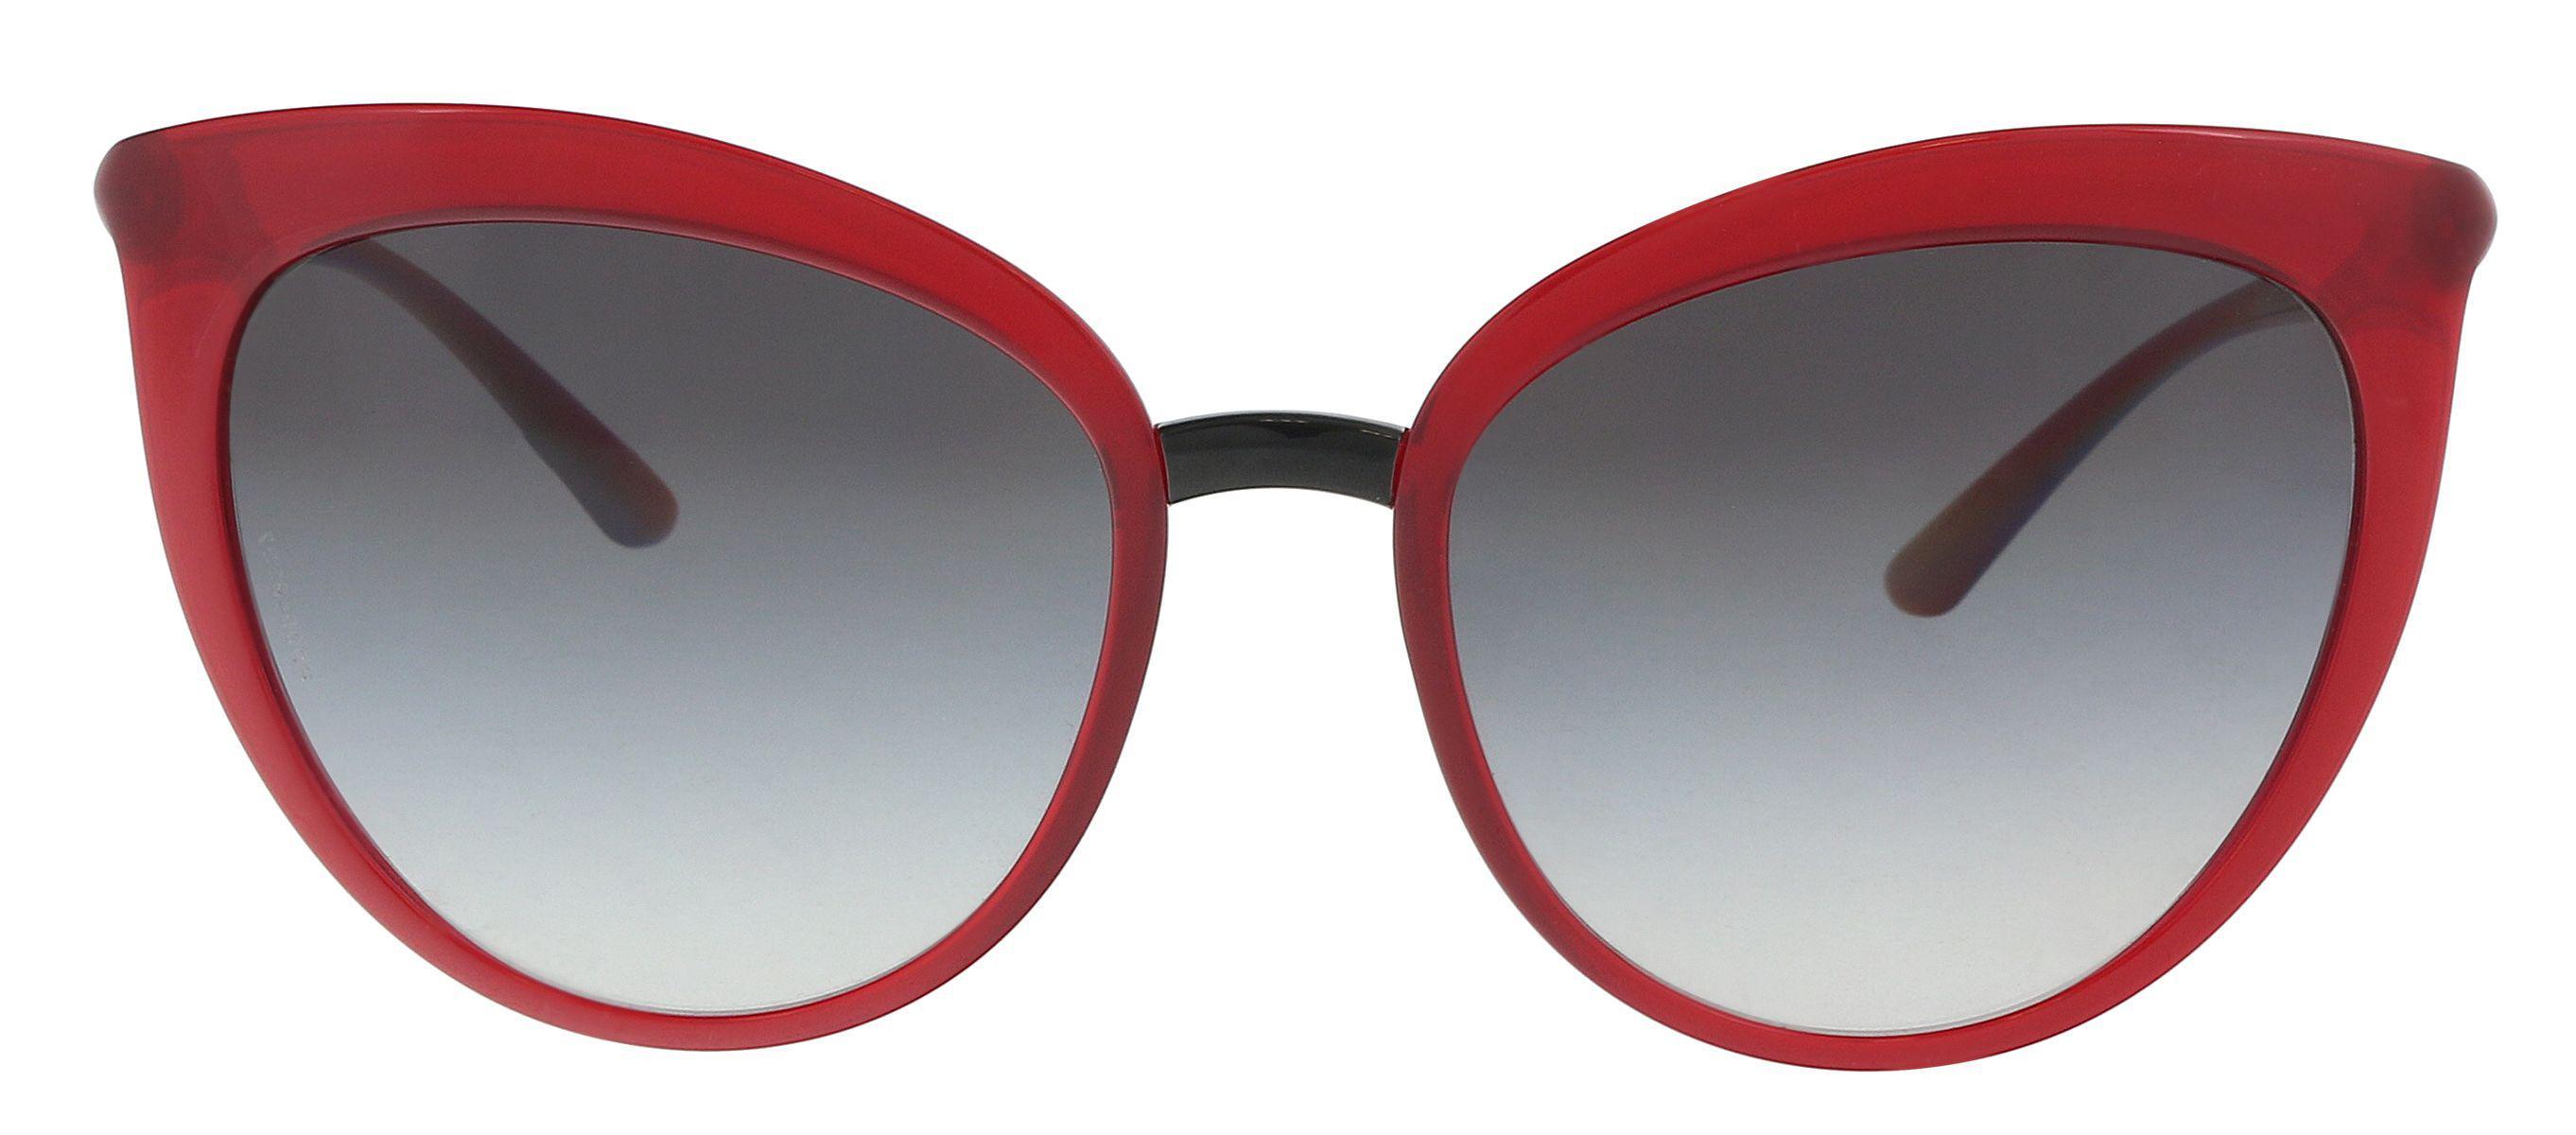 2781e3ecc1d Dolce   Gabbana. Women s Dg6113 30918g Transparent Bordeaux Cat Eye  Sunglasses